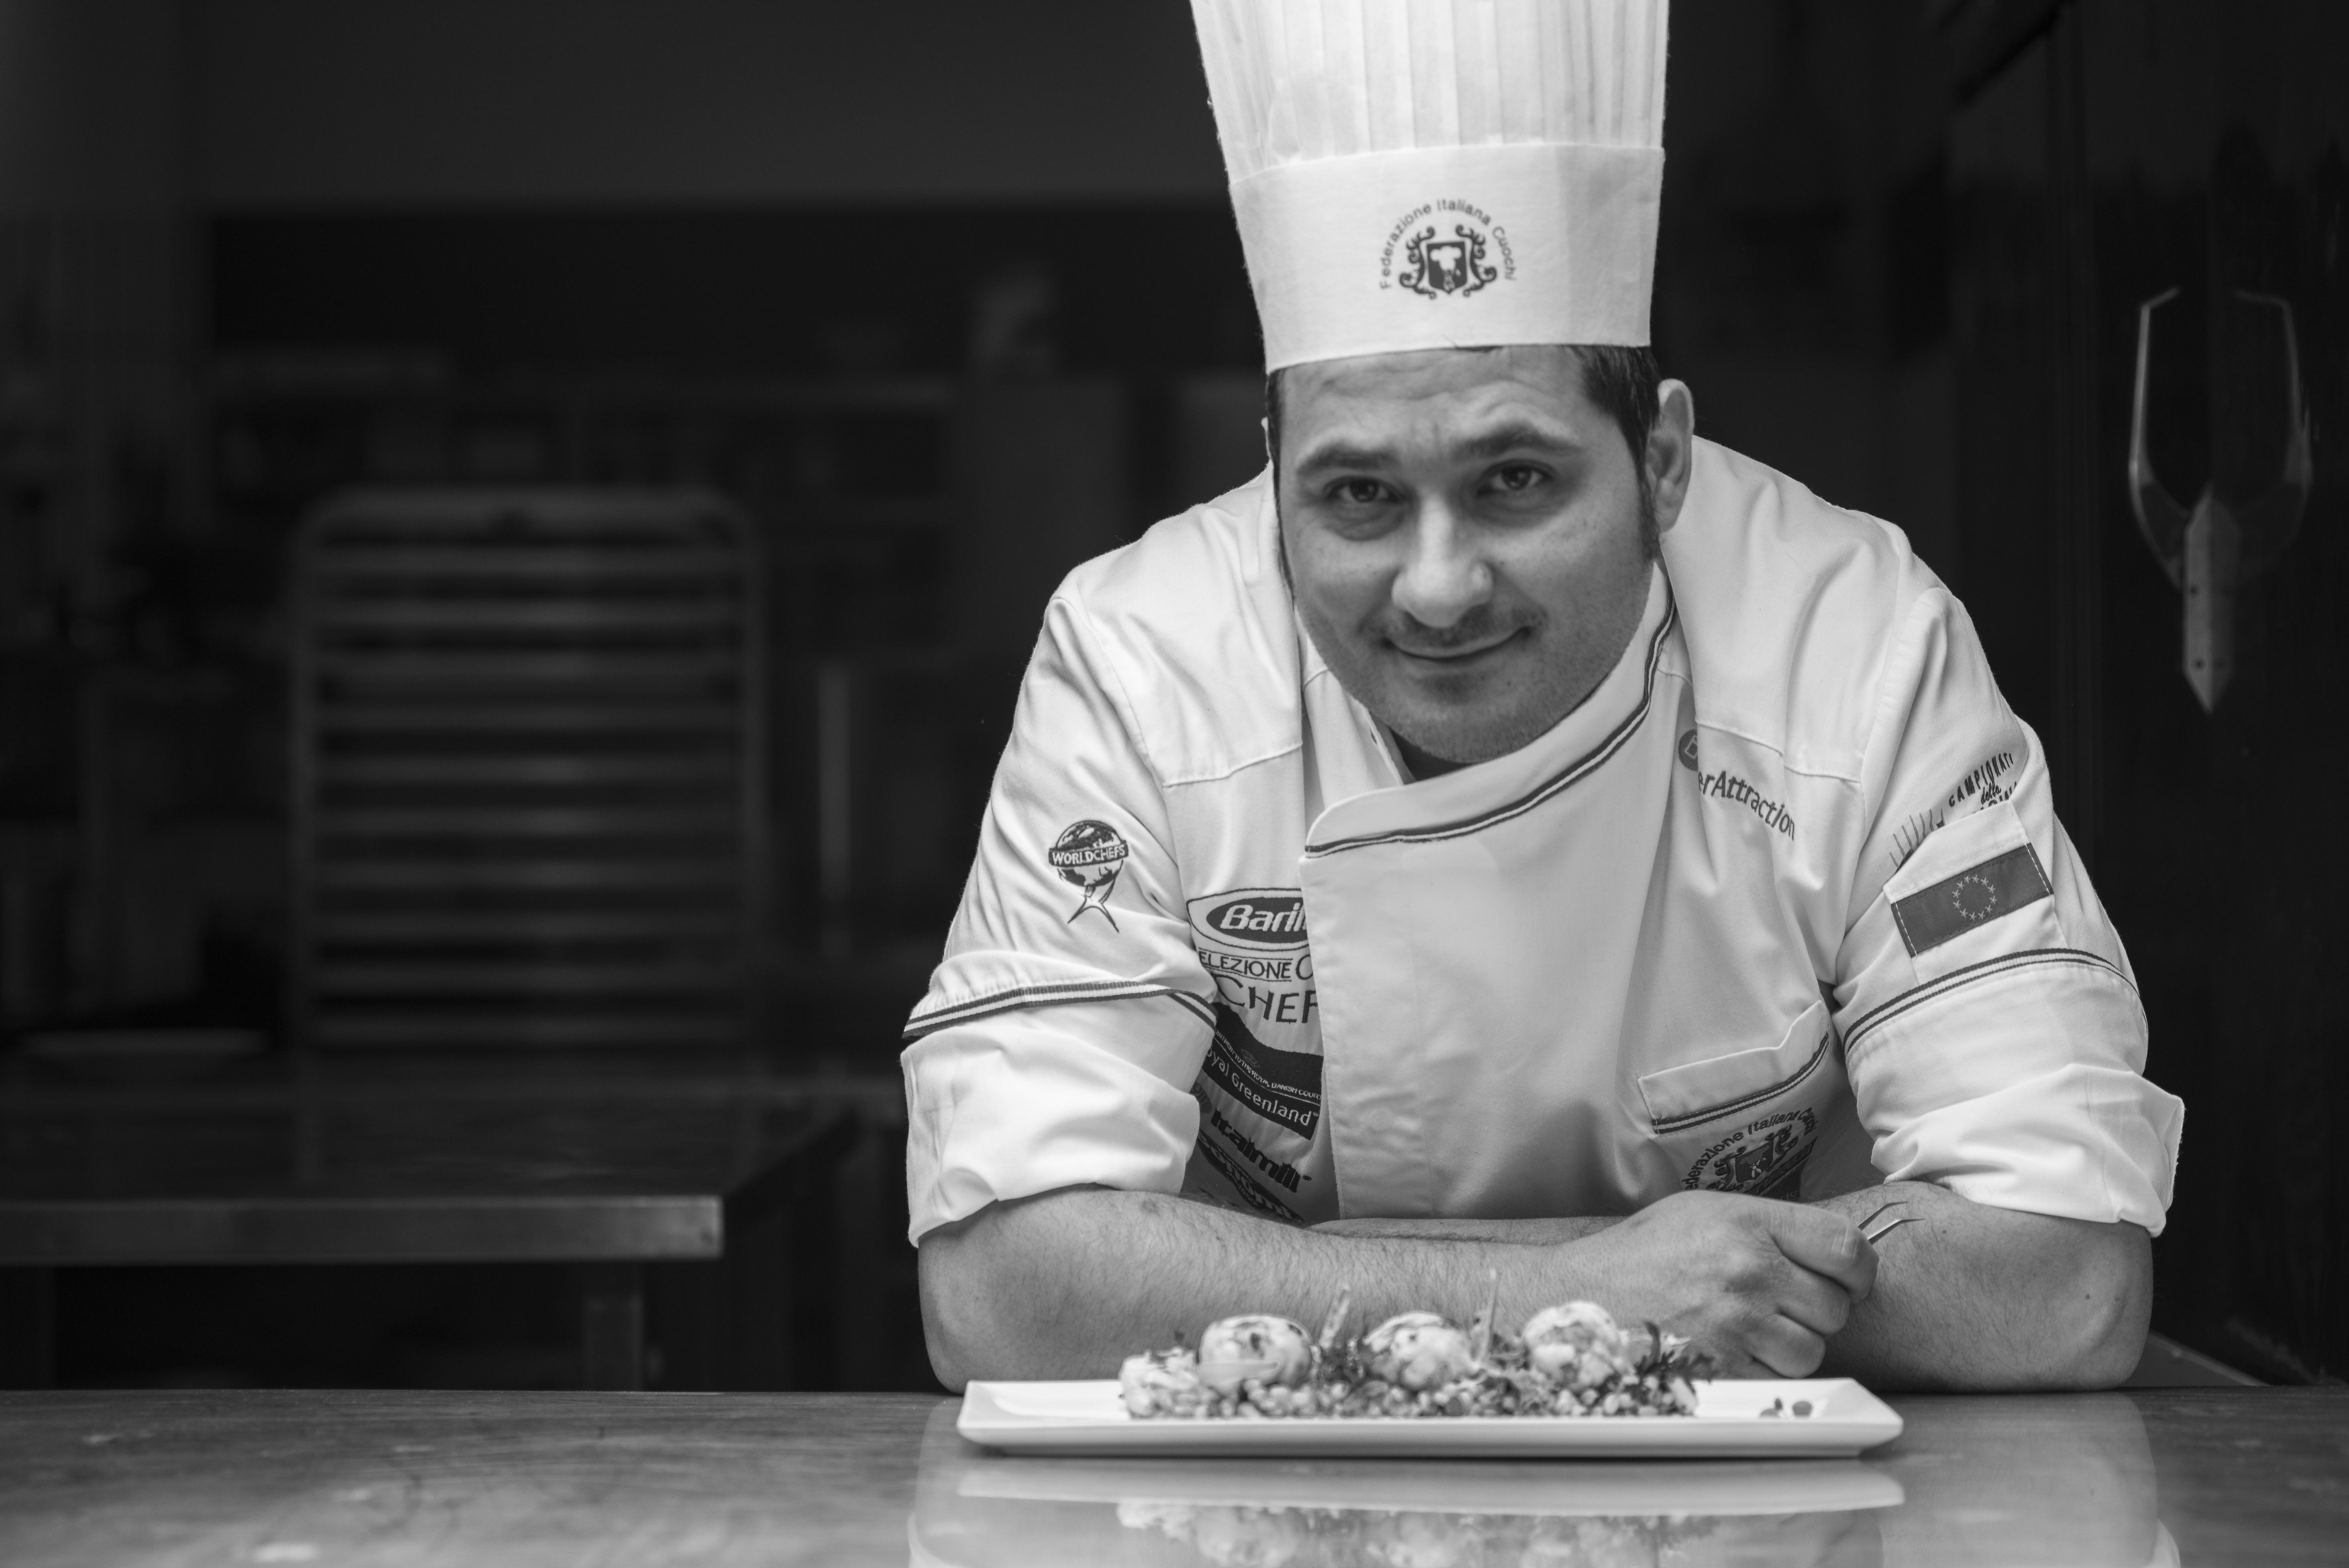 Chef Luigi Nastro